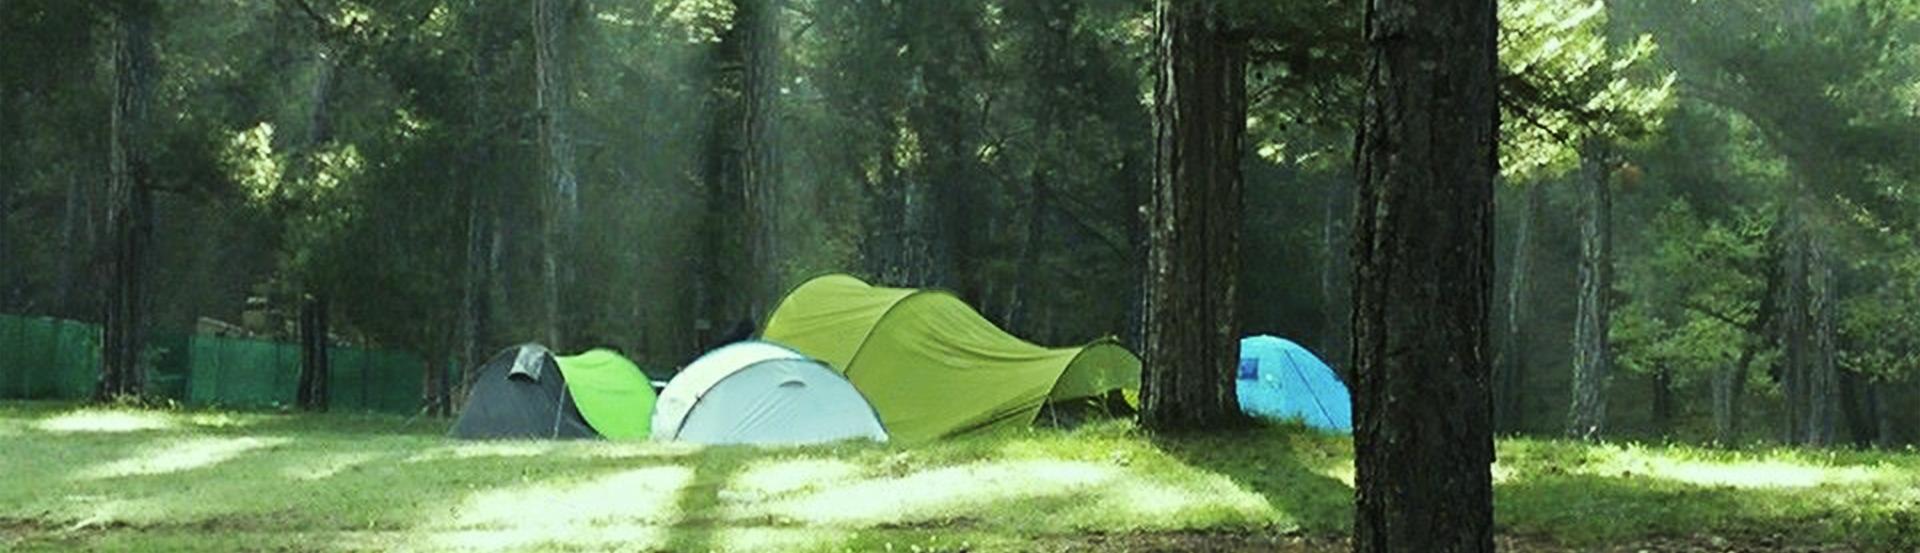 camping-ladehesa